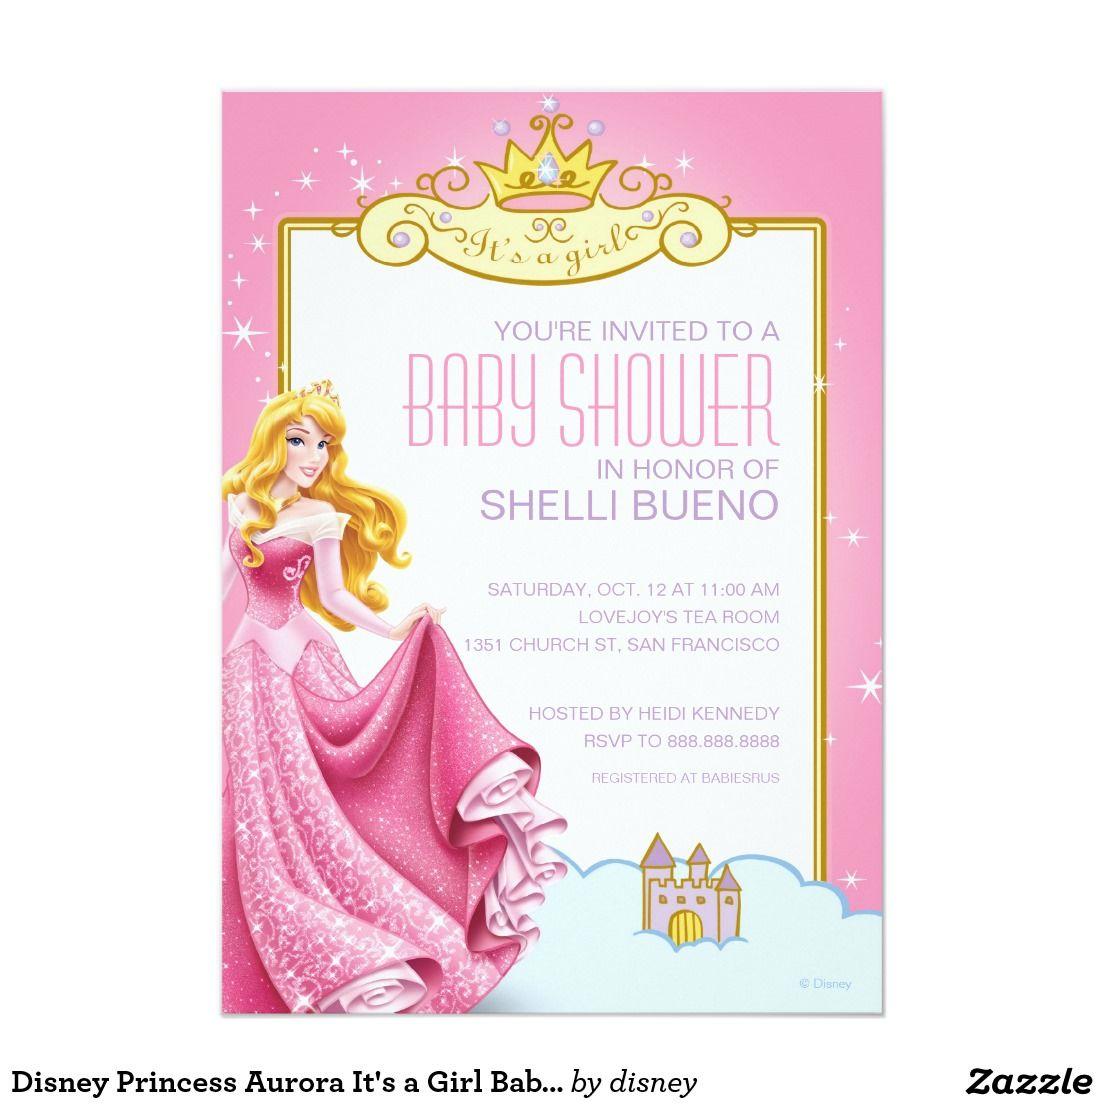 Disney Princess Aurora It\'s a Girl Baby Shower Card | Disney ...